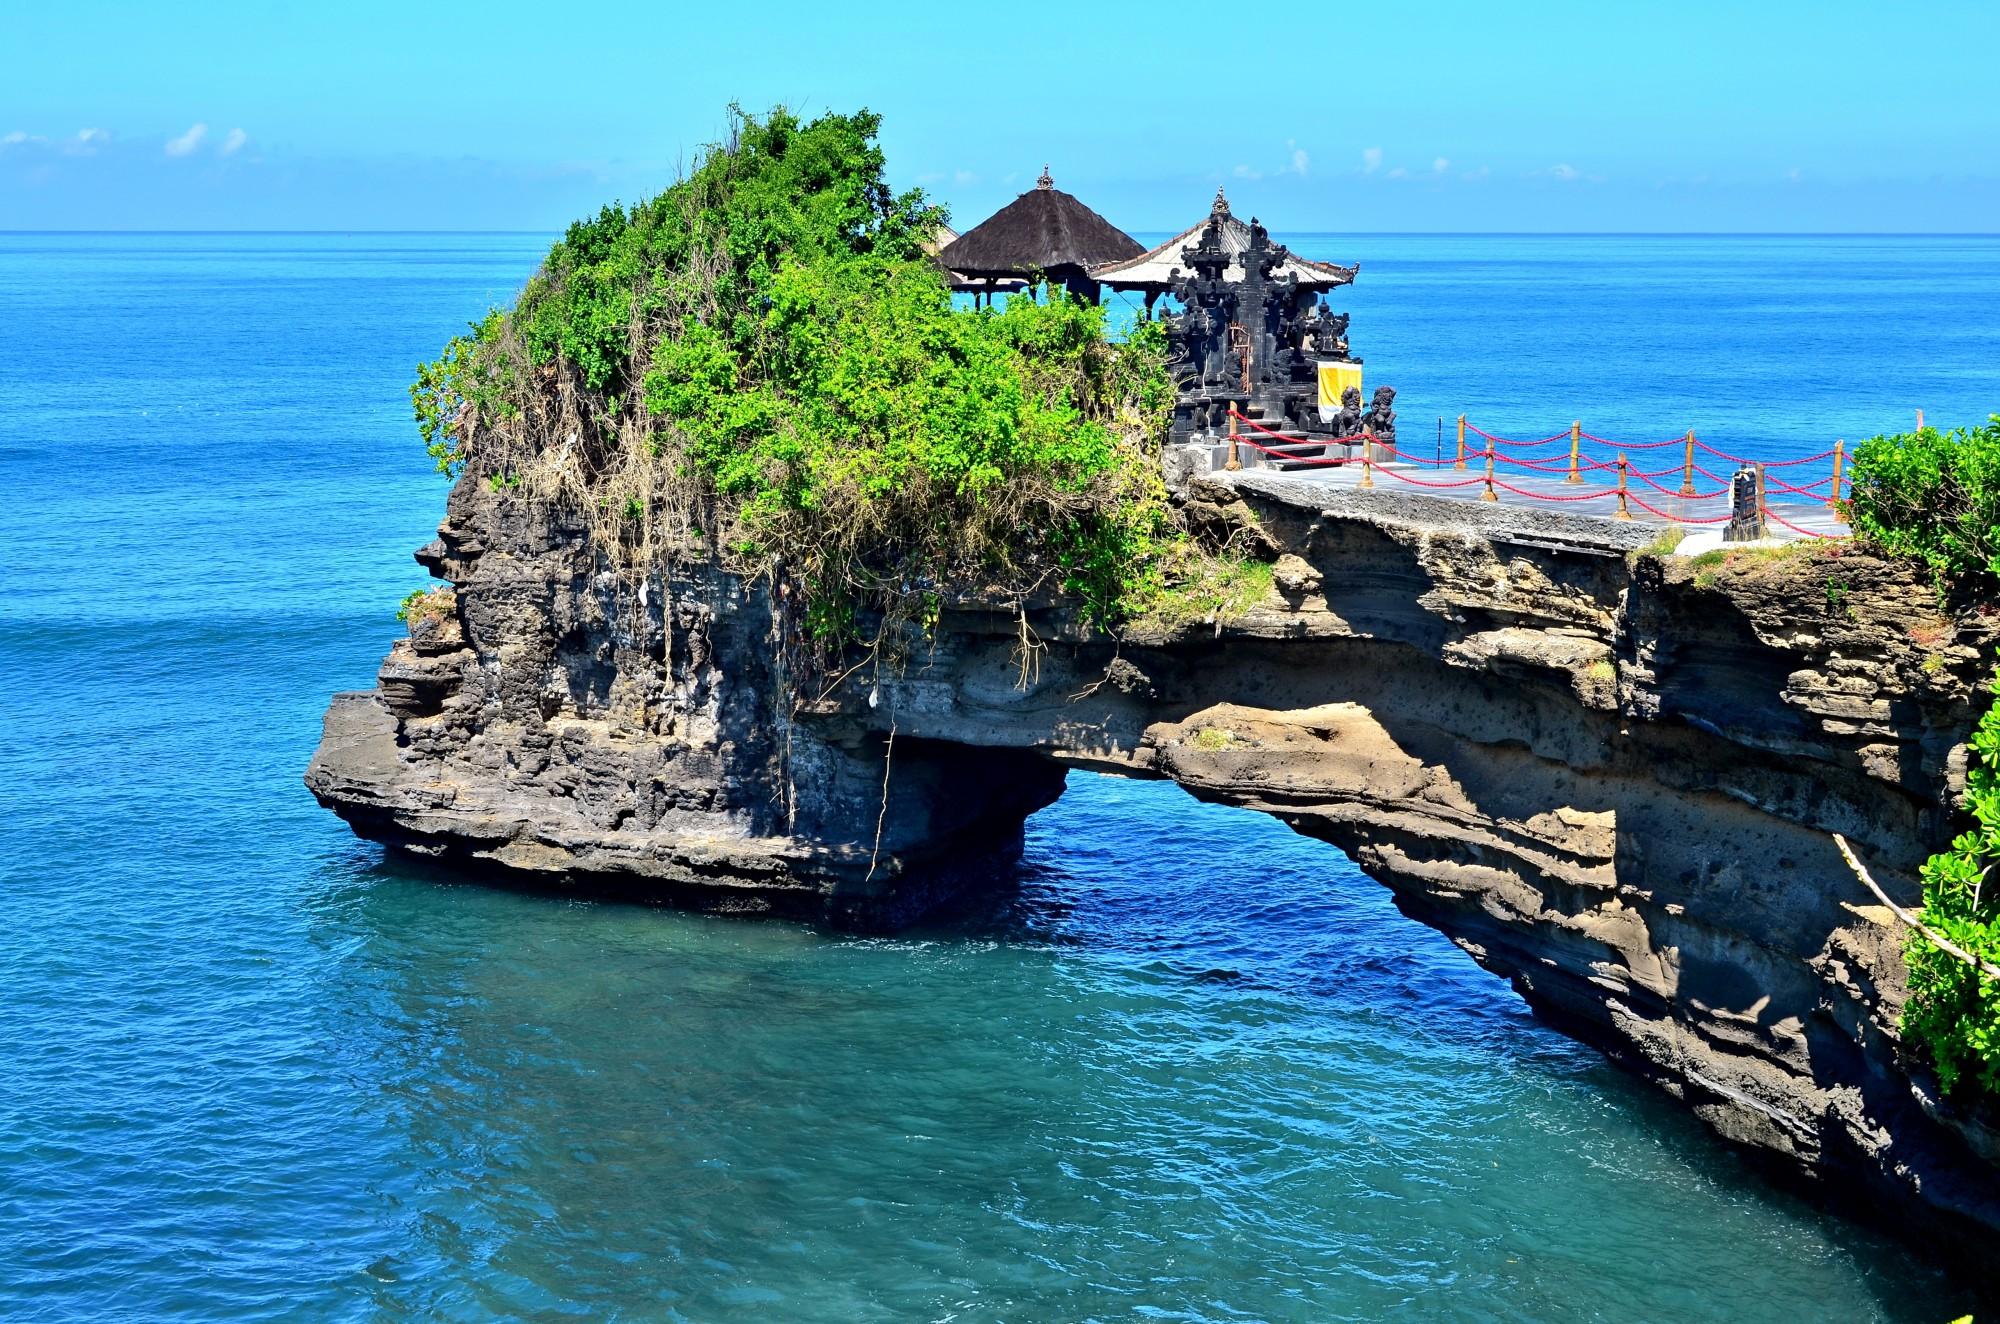 Pura Batu Bolong je jeden z chrámu v oblasti Tanah Lot vybudovaný na skále v moři